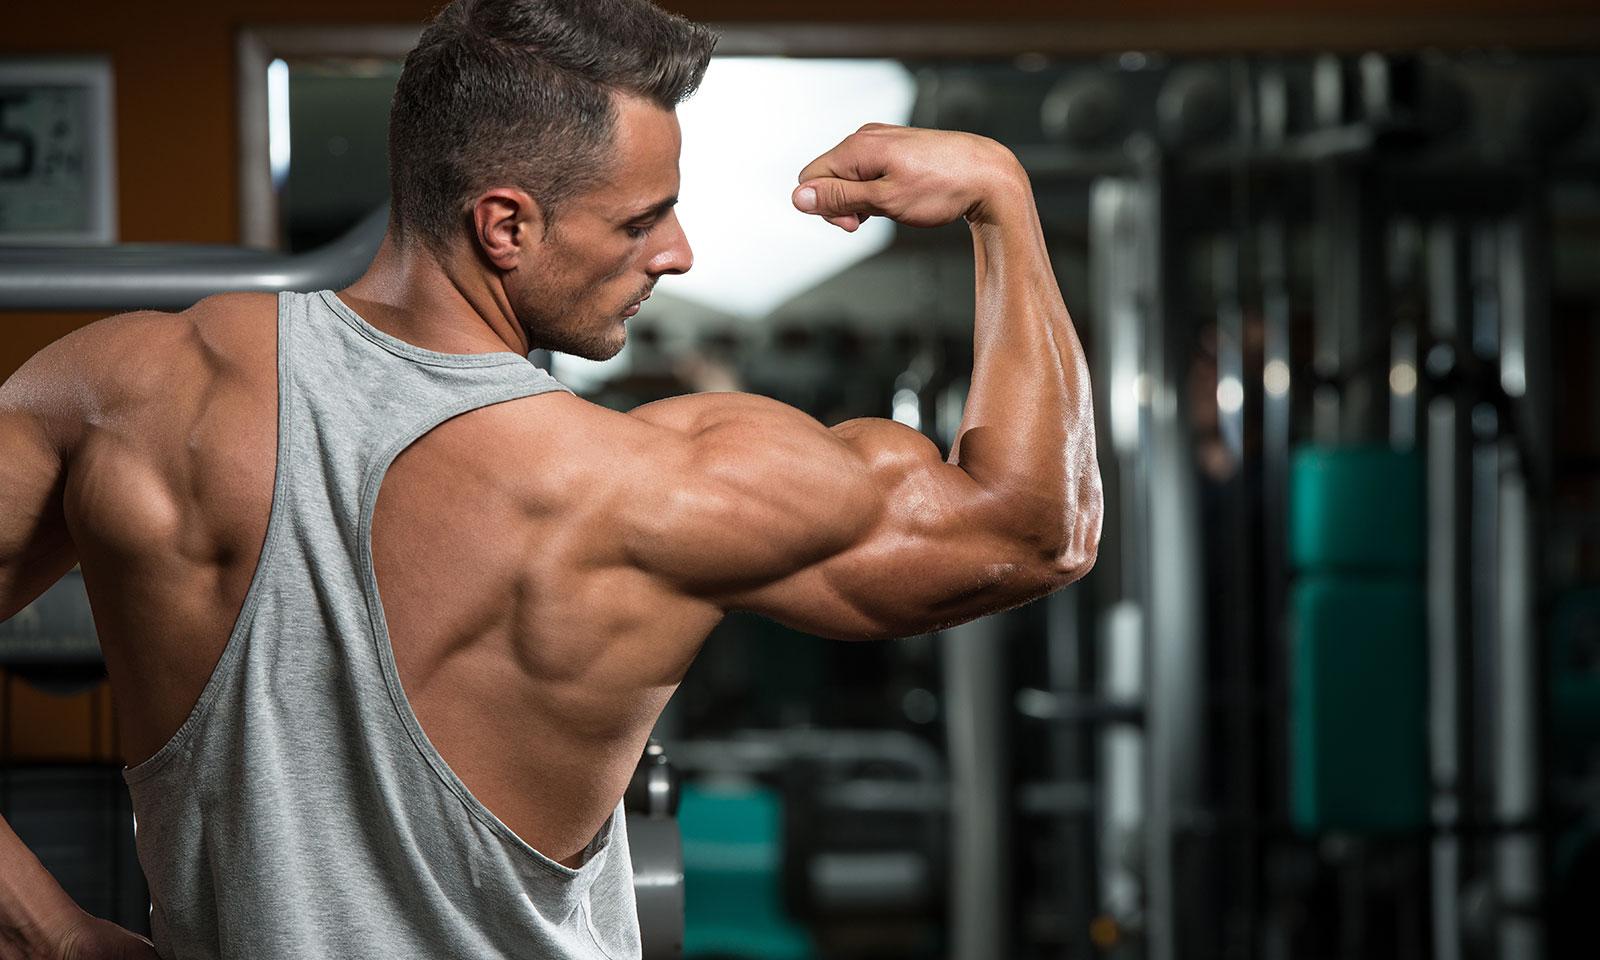 бодибилдинг картинка мышц всем